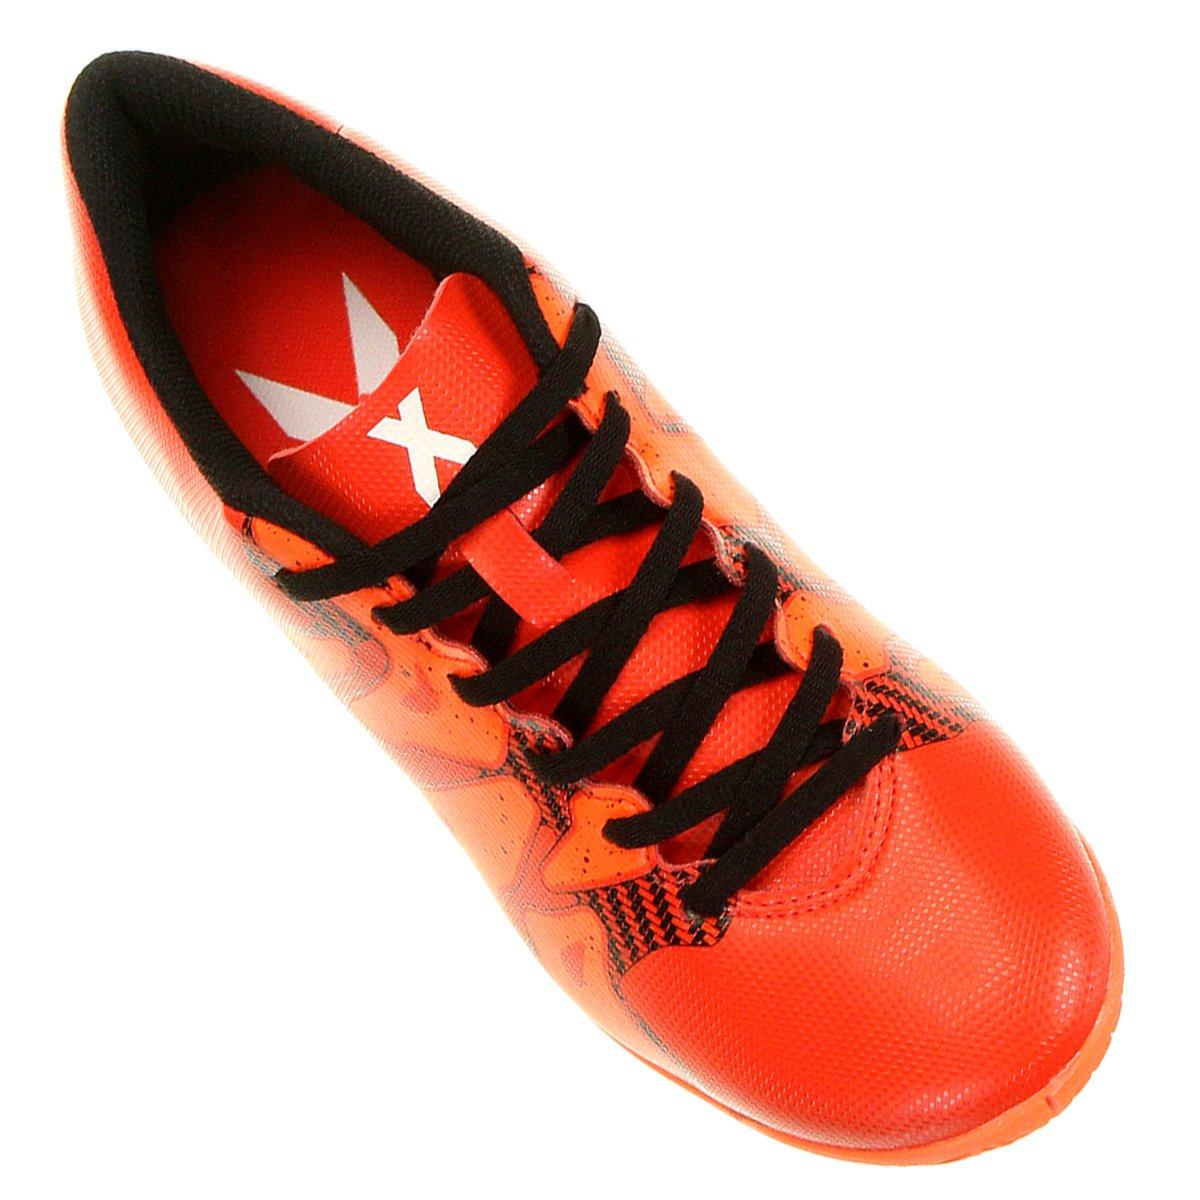 Chuteira Futsal Adidas X 15 4 IN Masculina - Laranja - Compre Agora ... 4f692aebe16d7